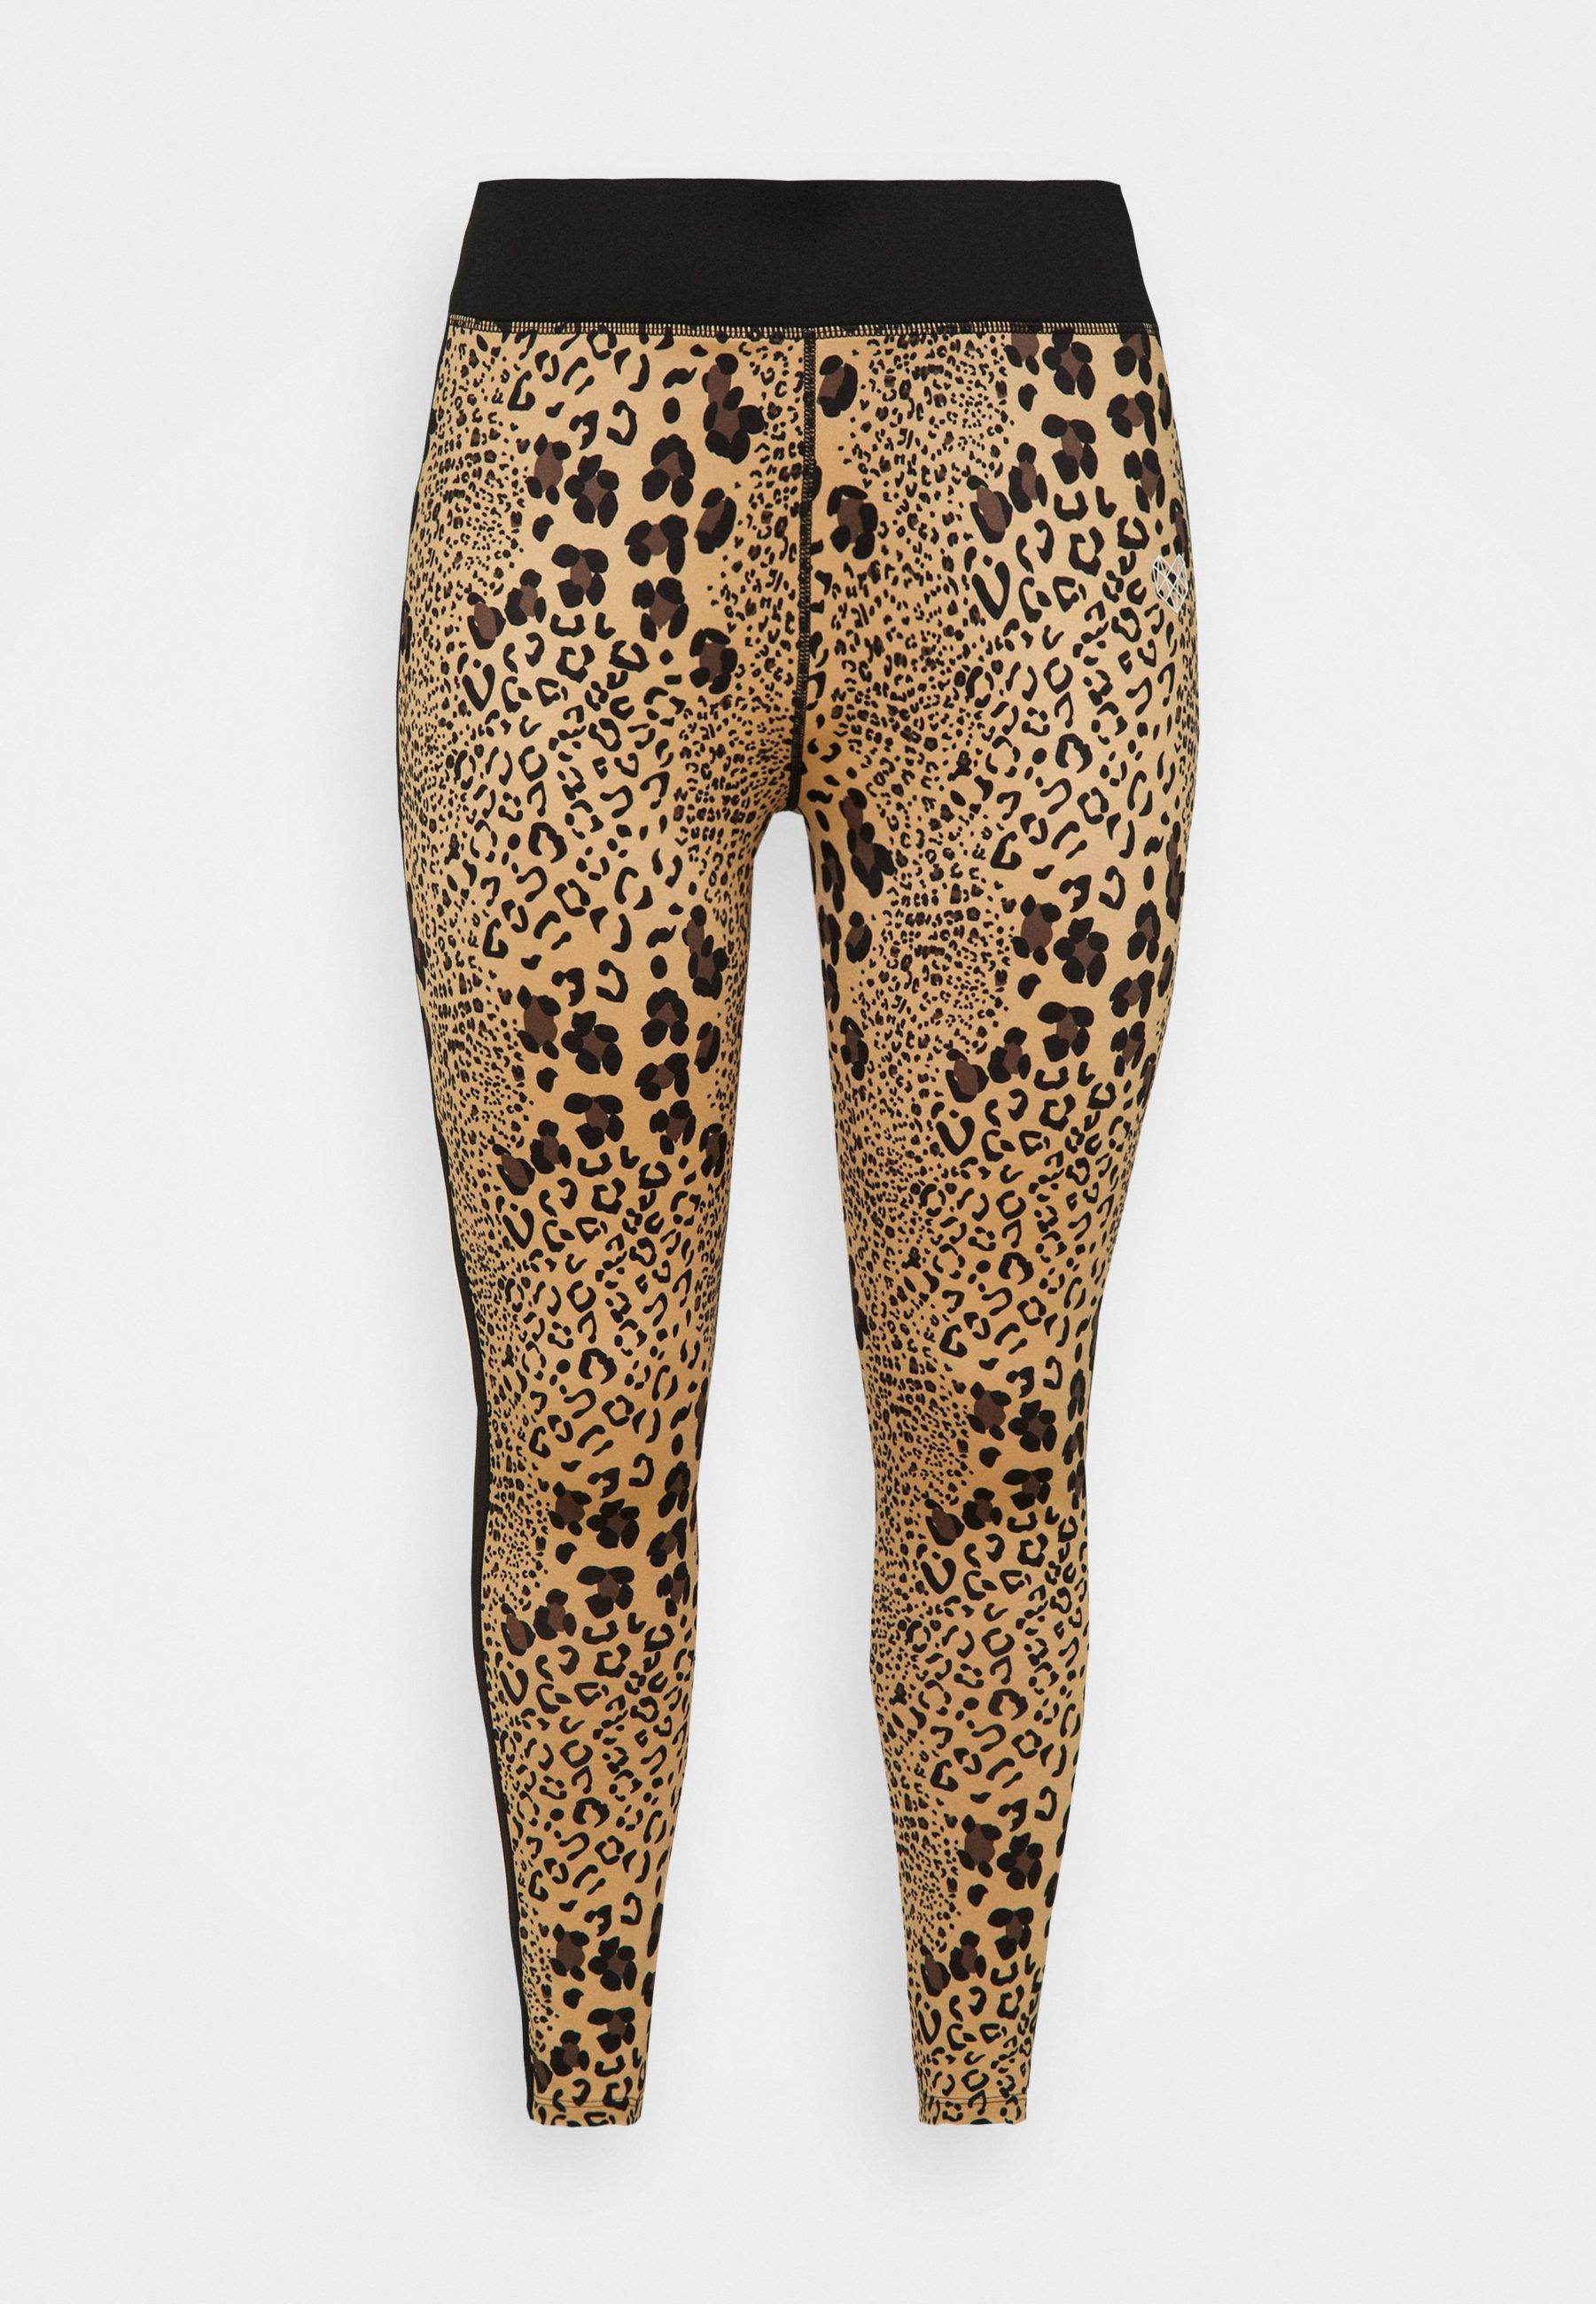 Femme BOCA LEOPARD TIGHT CURVE - Collants